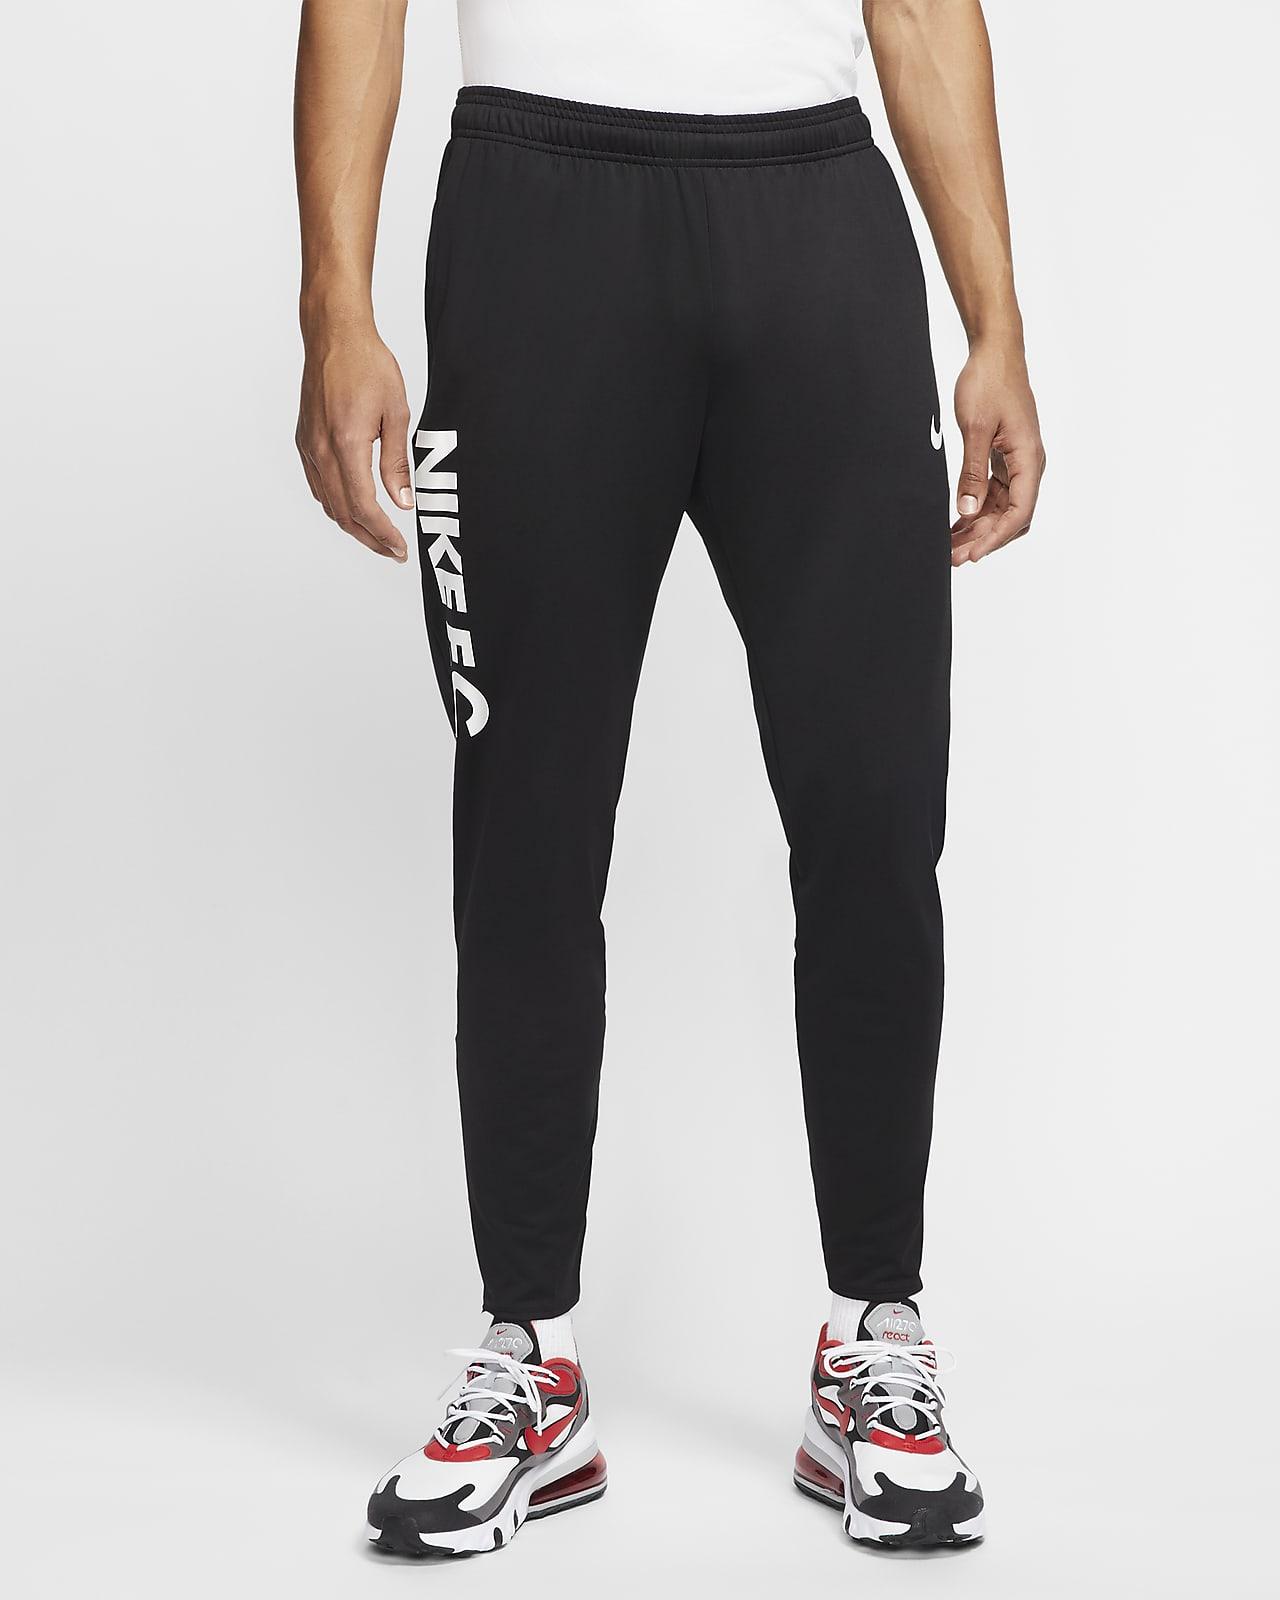 Pantalones De Futbol Para Hombre Nike F C Essential Nike Mx